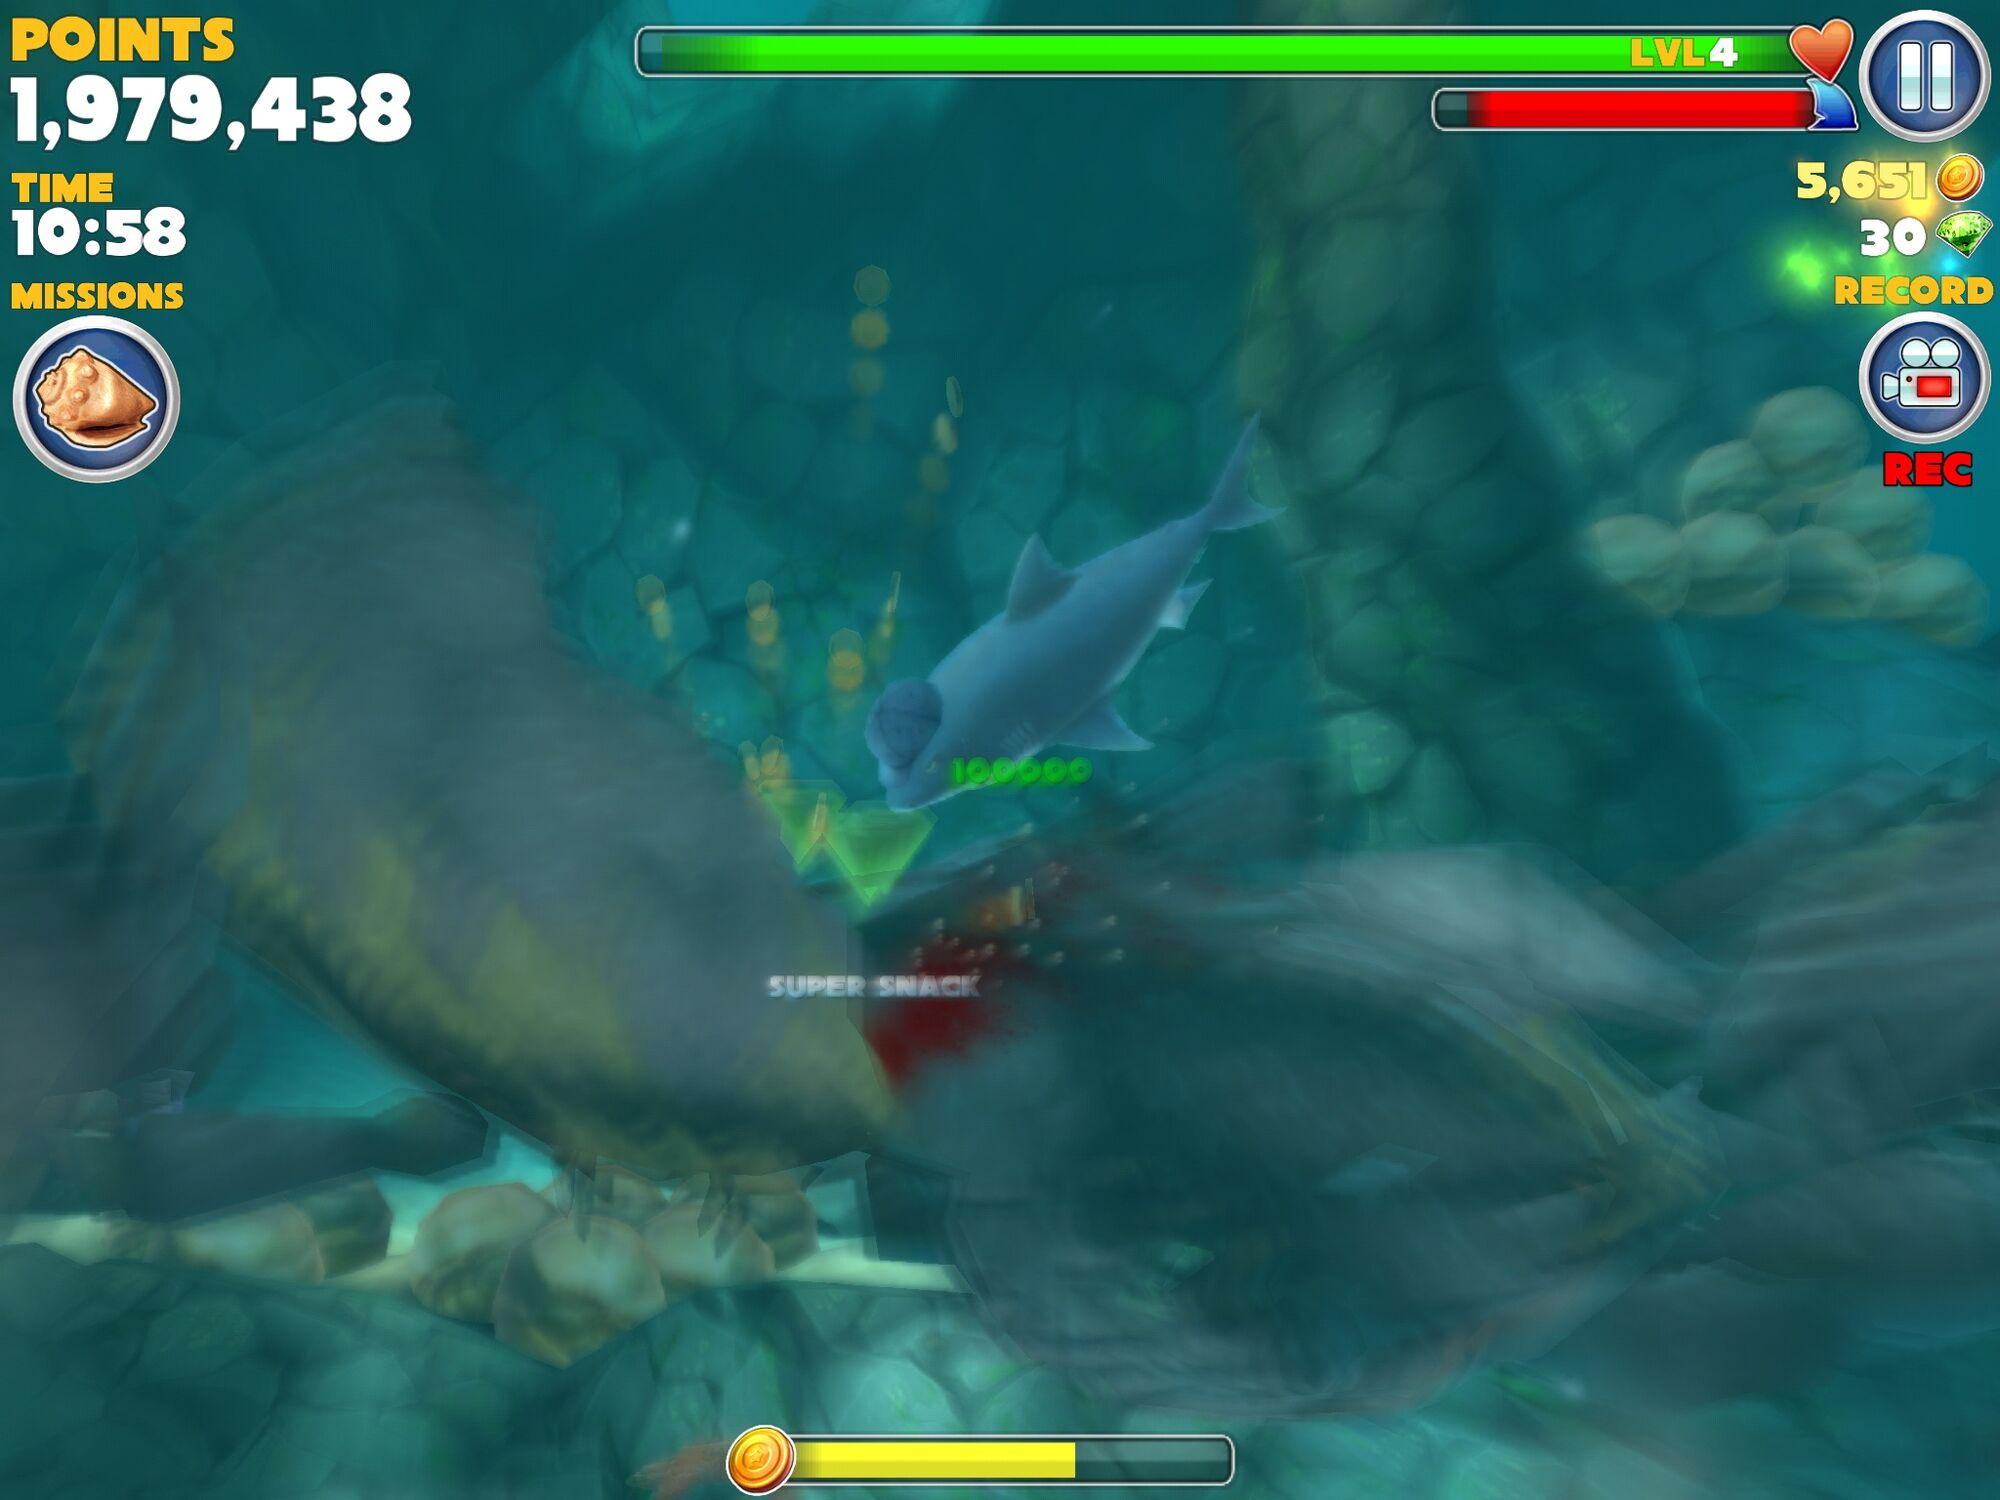 Hungry shark evolution megalodon vs giant crab - photo#54